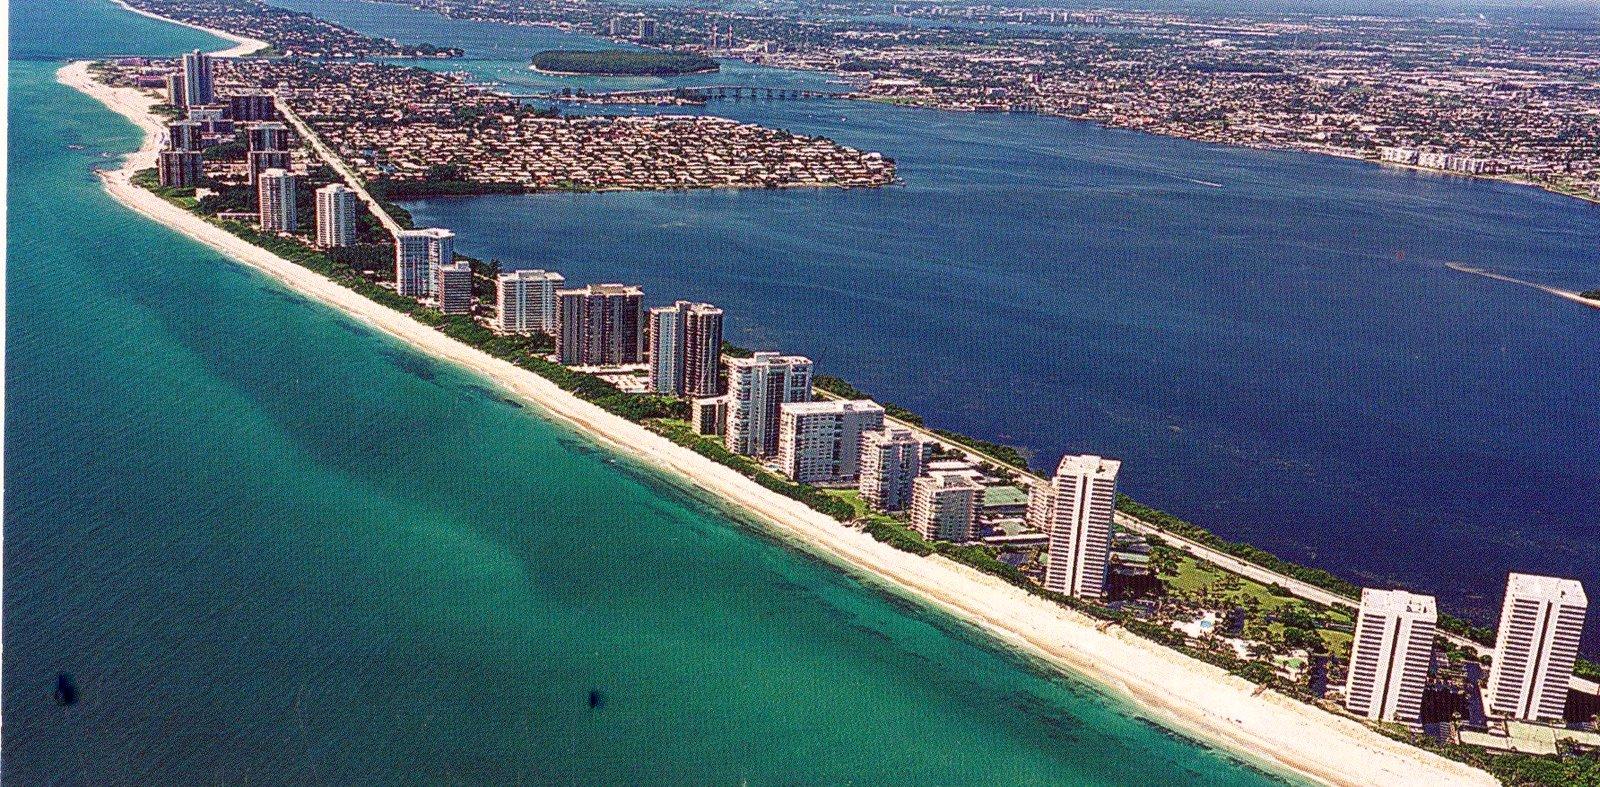 Singer Island (FL) United States  city images : Monuments of the world: Palm Beach Island, Florida United States